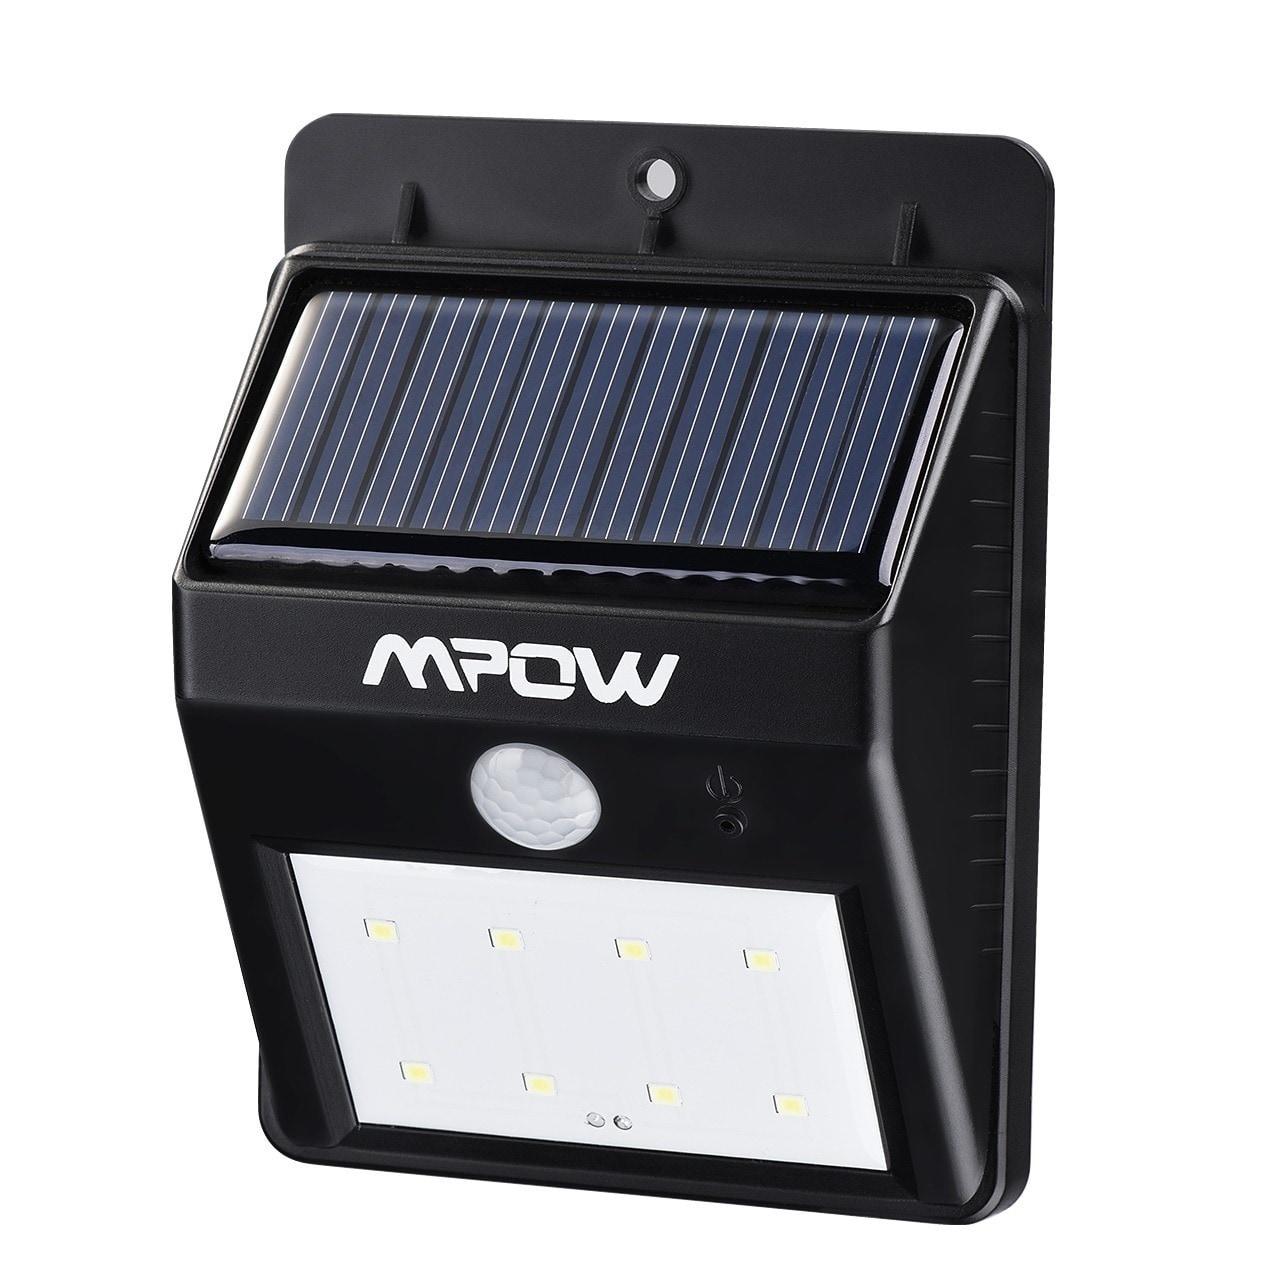 Mpow 8 LED Light Source Solar Powerd Wireless Security Mo...